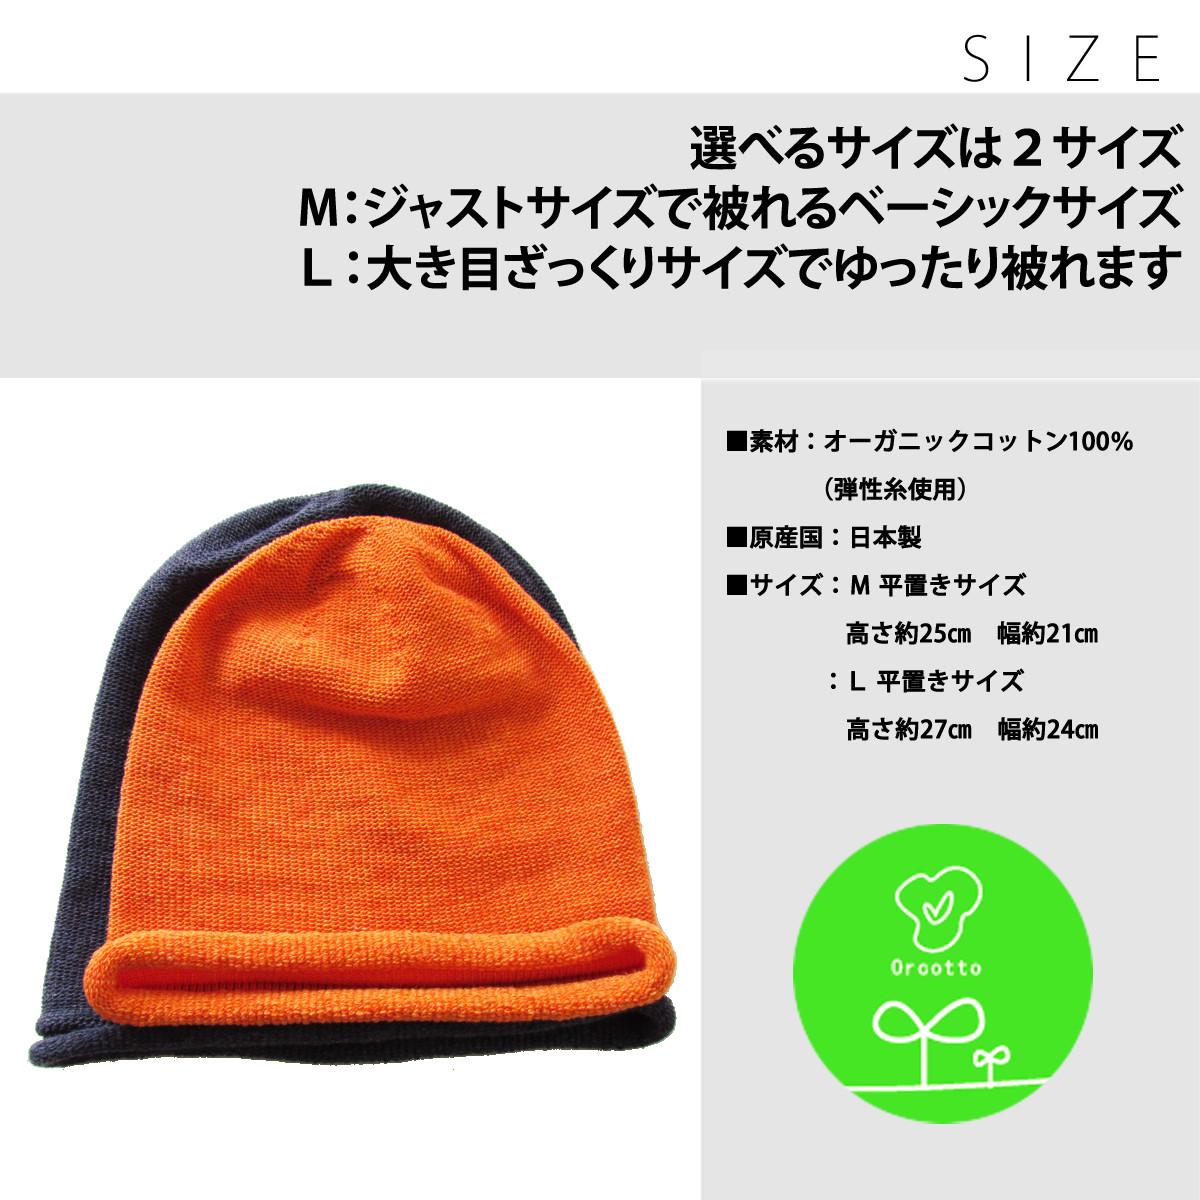 71f111aabbffd Hats   Cap Men s Ladies Knitted Hat Organic Cotton Watch Cap S S ...